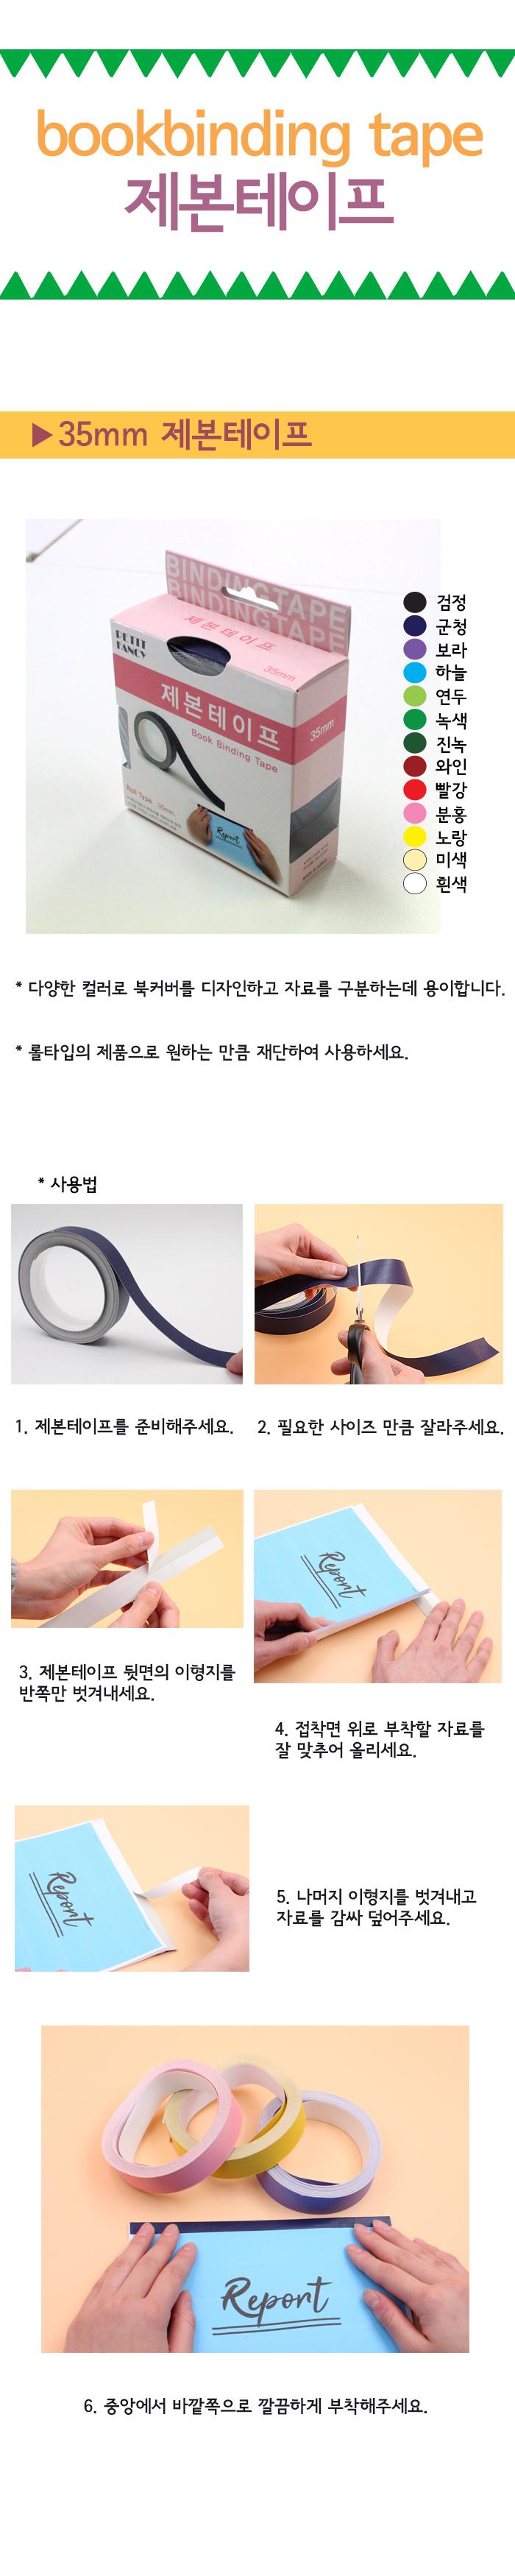 bookbinding_tape_35.jpg